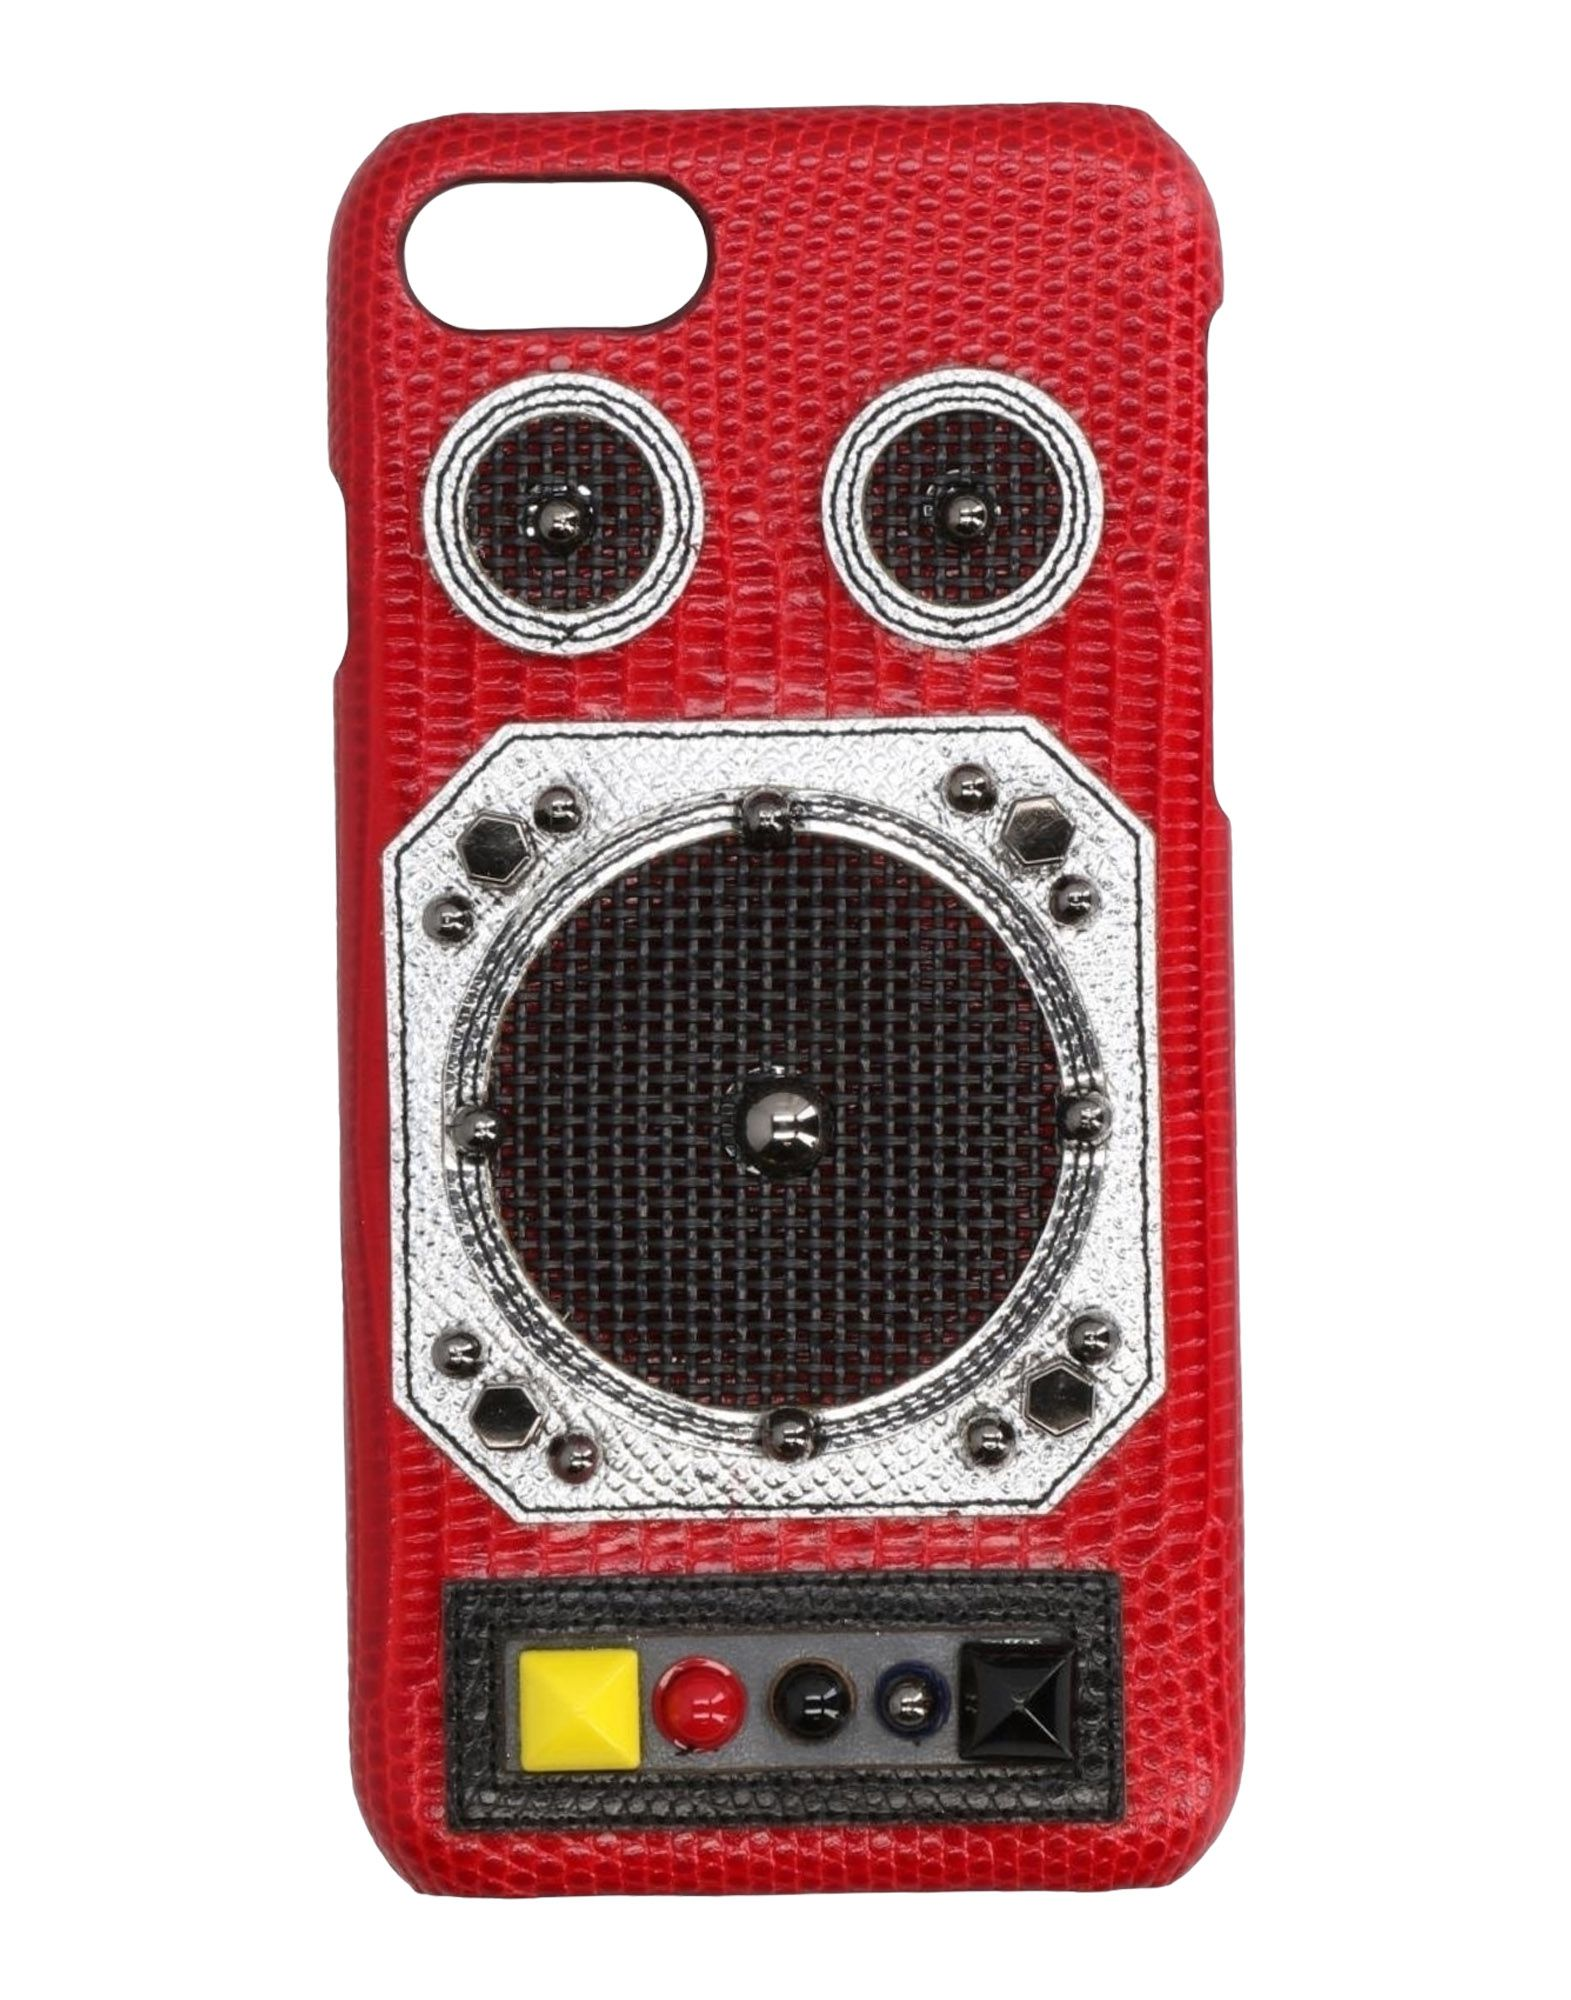 DOLCE & GABBANA Herren Hightech Accessoire Farbe Rot Größe 1 jetztbilligerkaufen